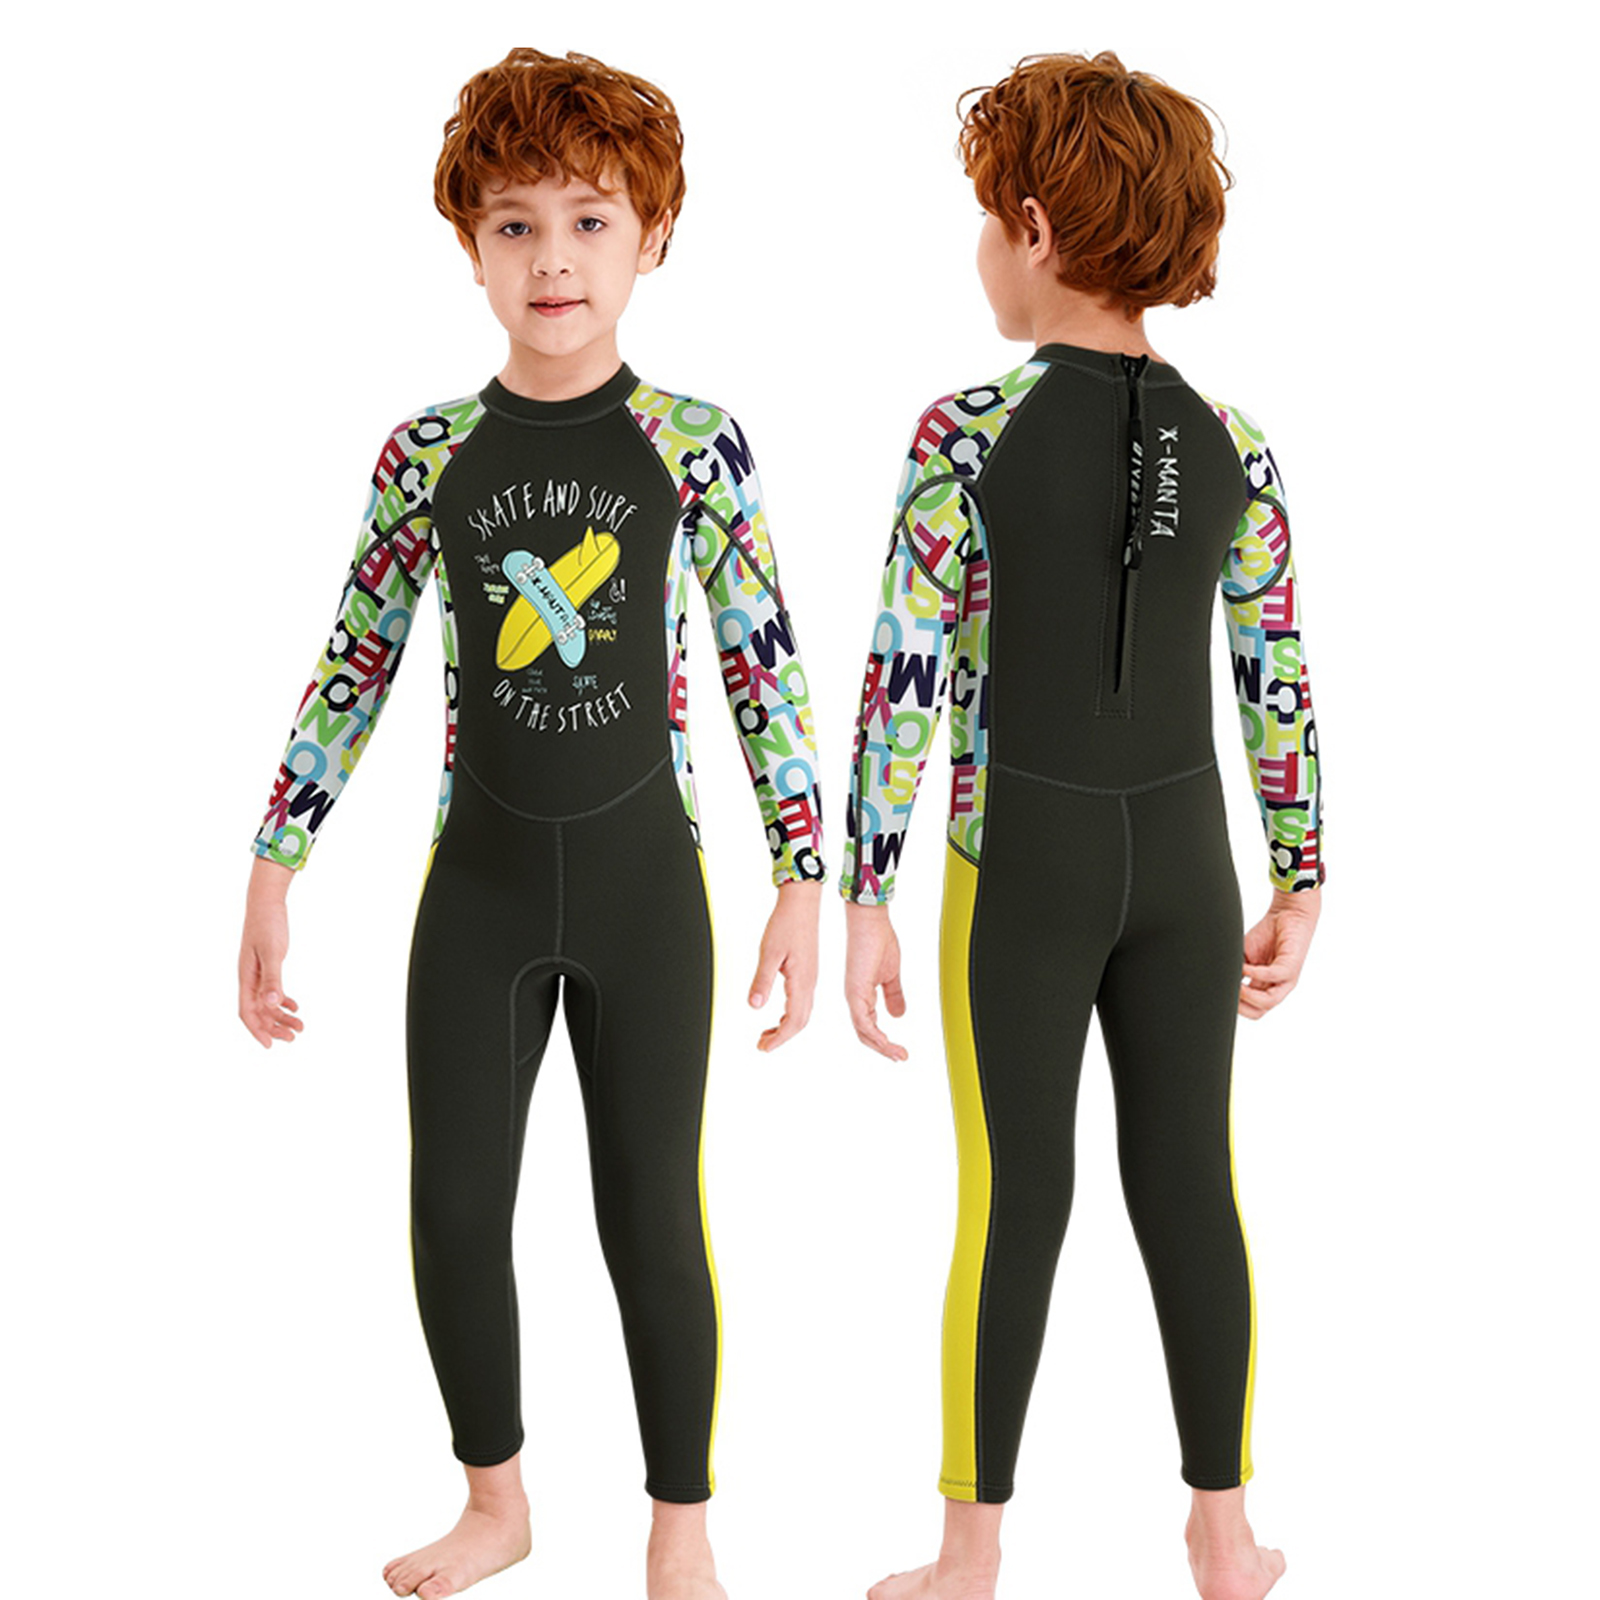 Kids Wetsuit Premium 2.5mm Neoprene Warm Full Body Diving Suit Scuba Back Zip Rash Guard One Piece Long Sleeve Jumpsuit